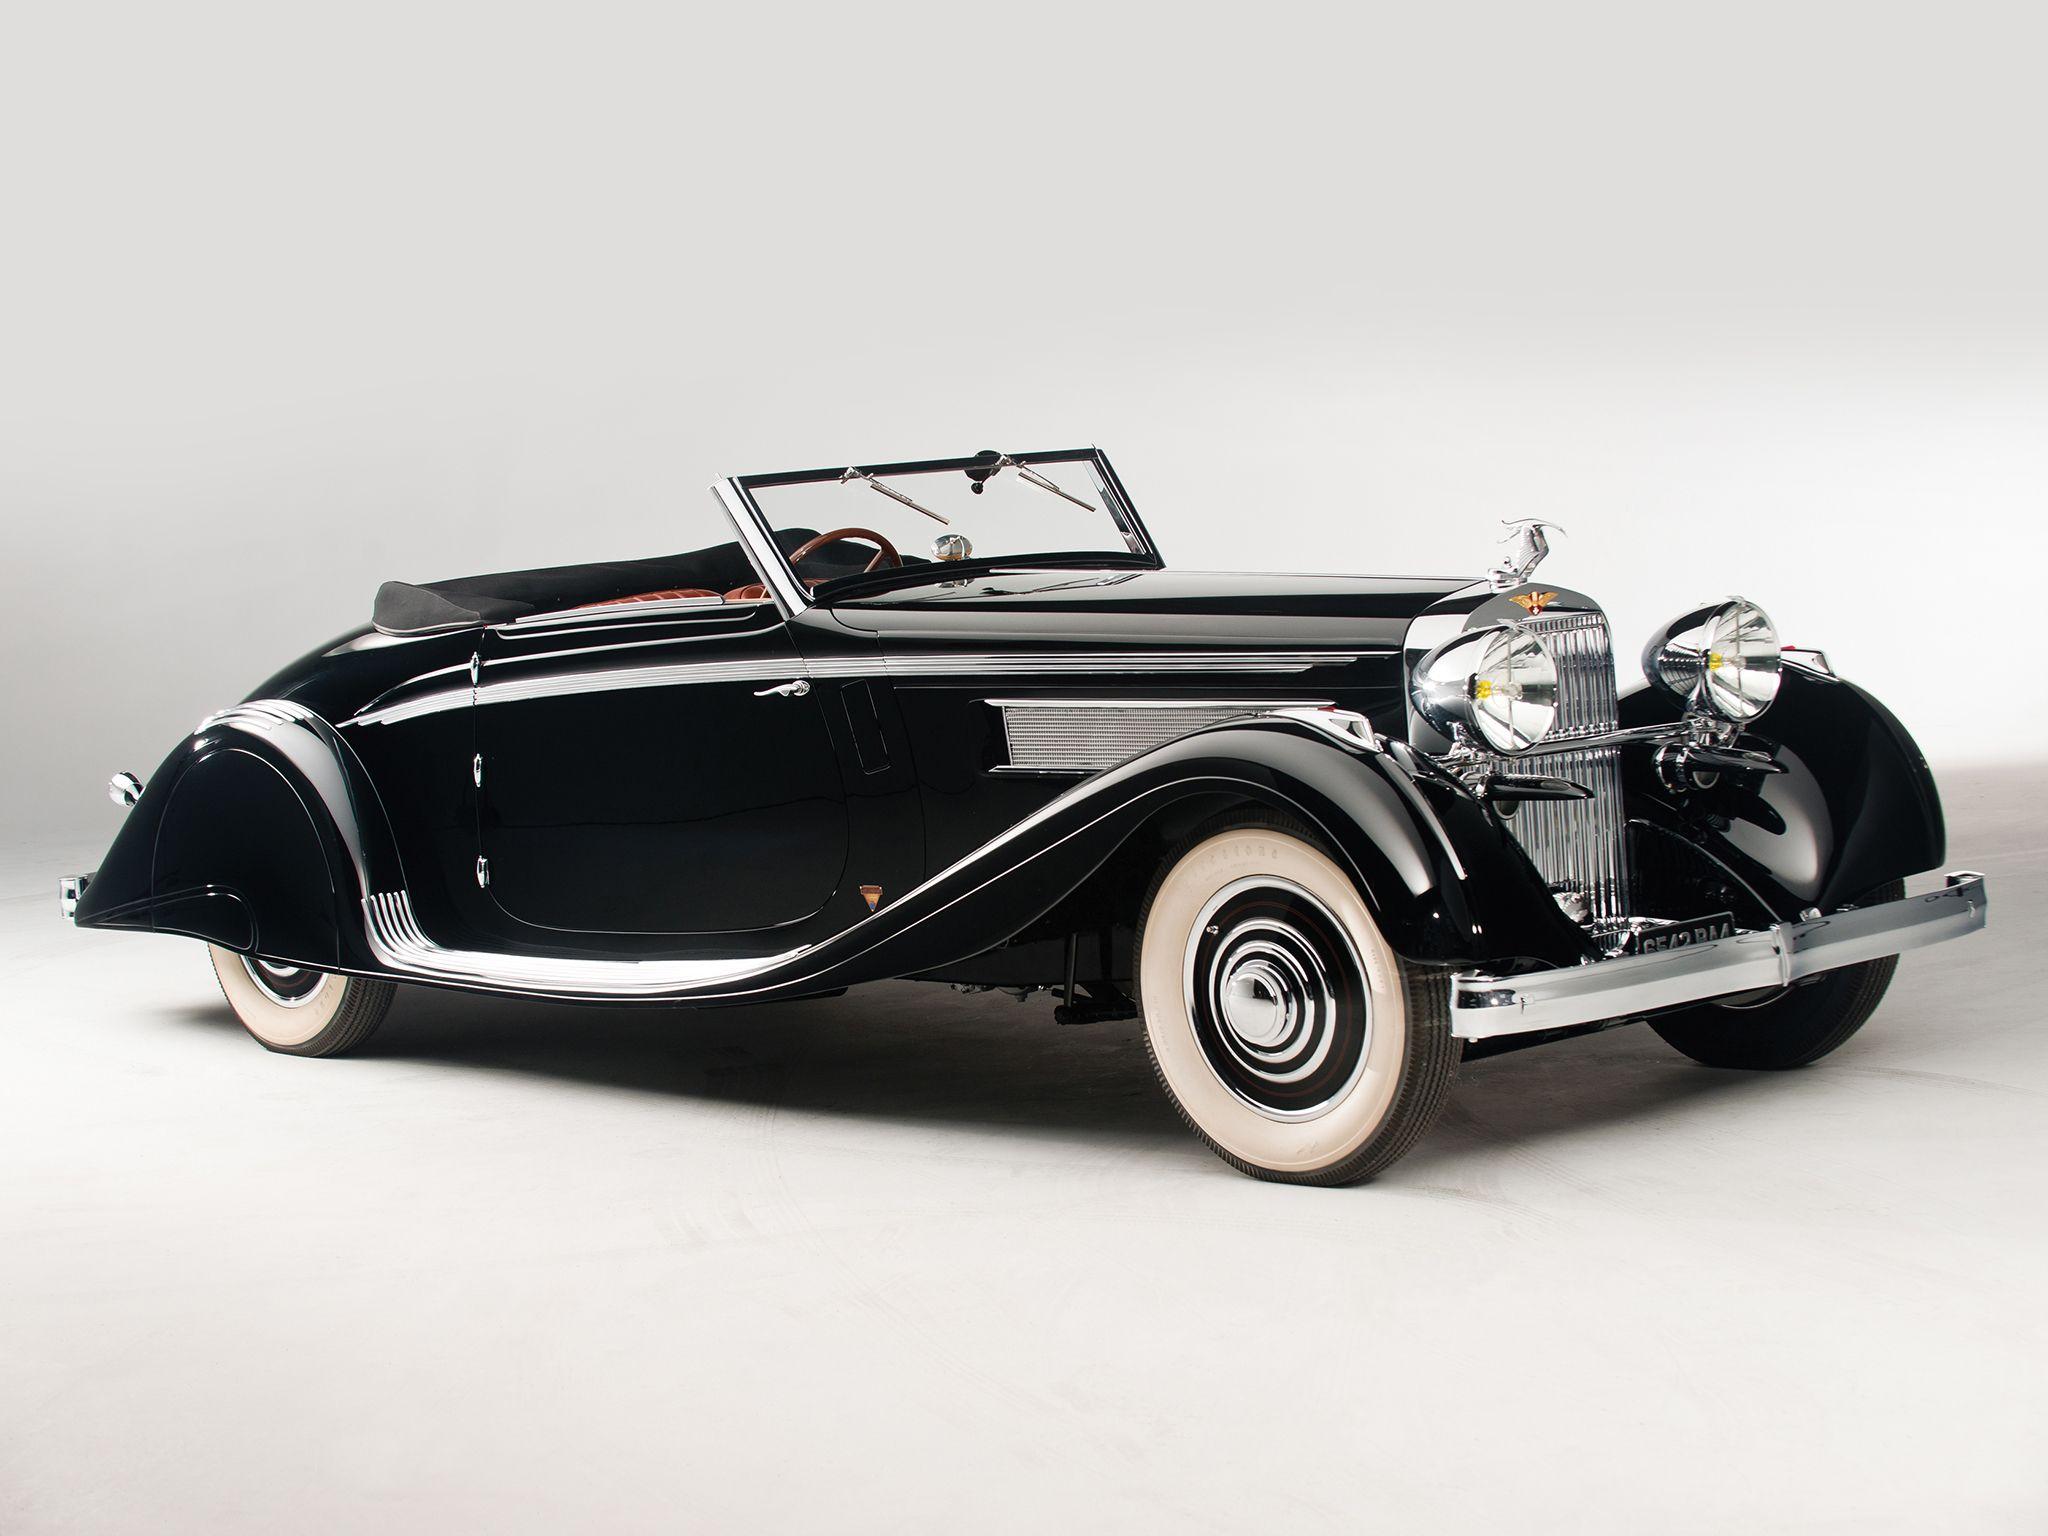 Hispano-Suiza - Google Search | motor vehicles, motor bikes ...